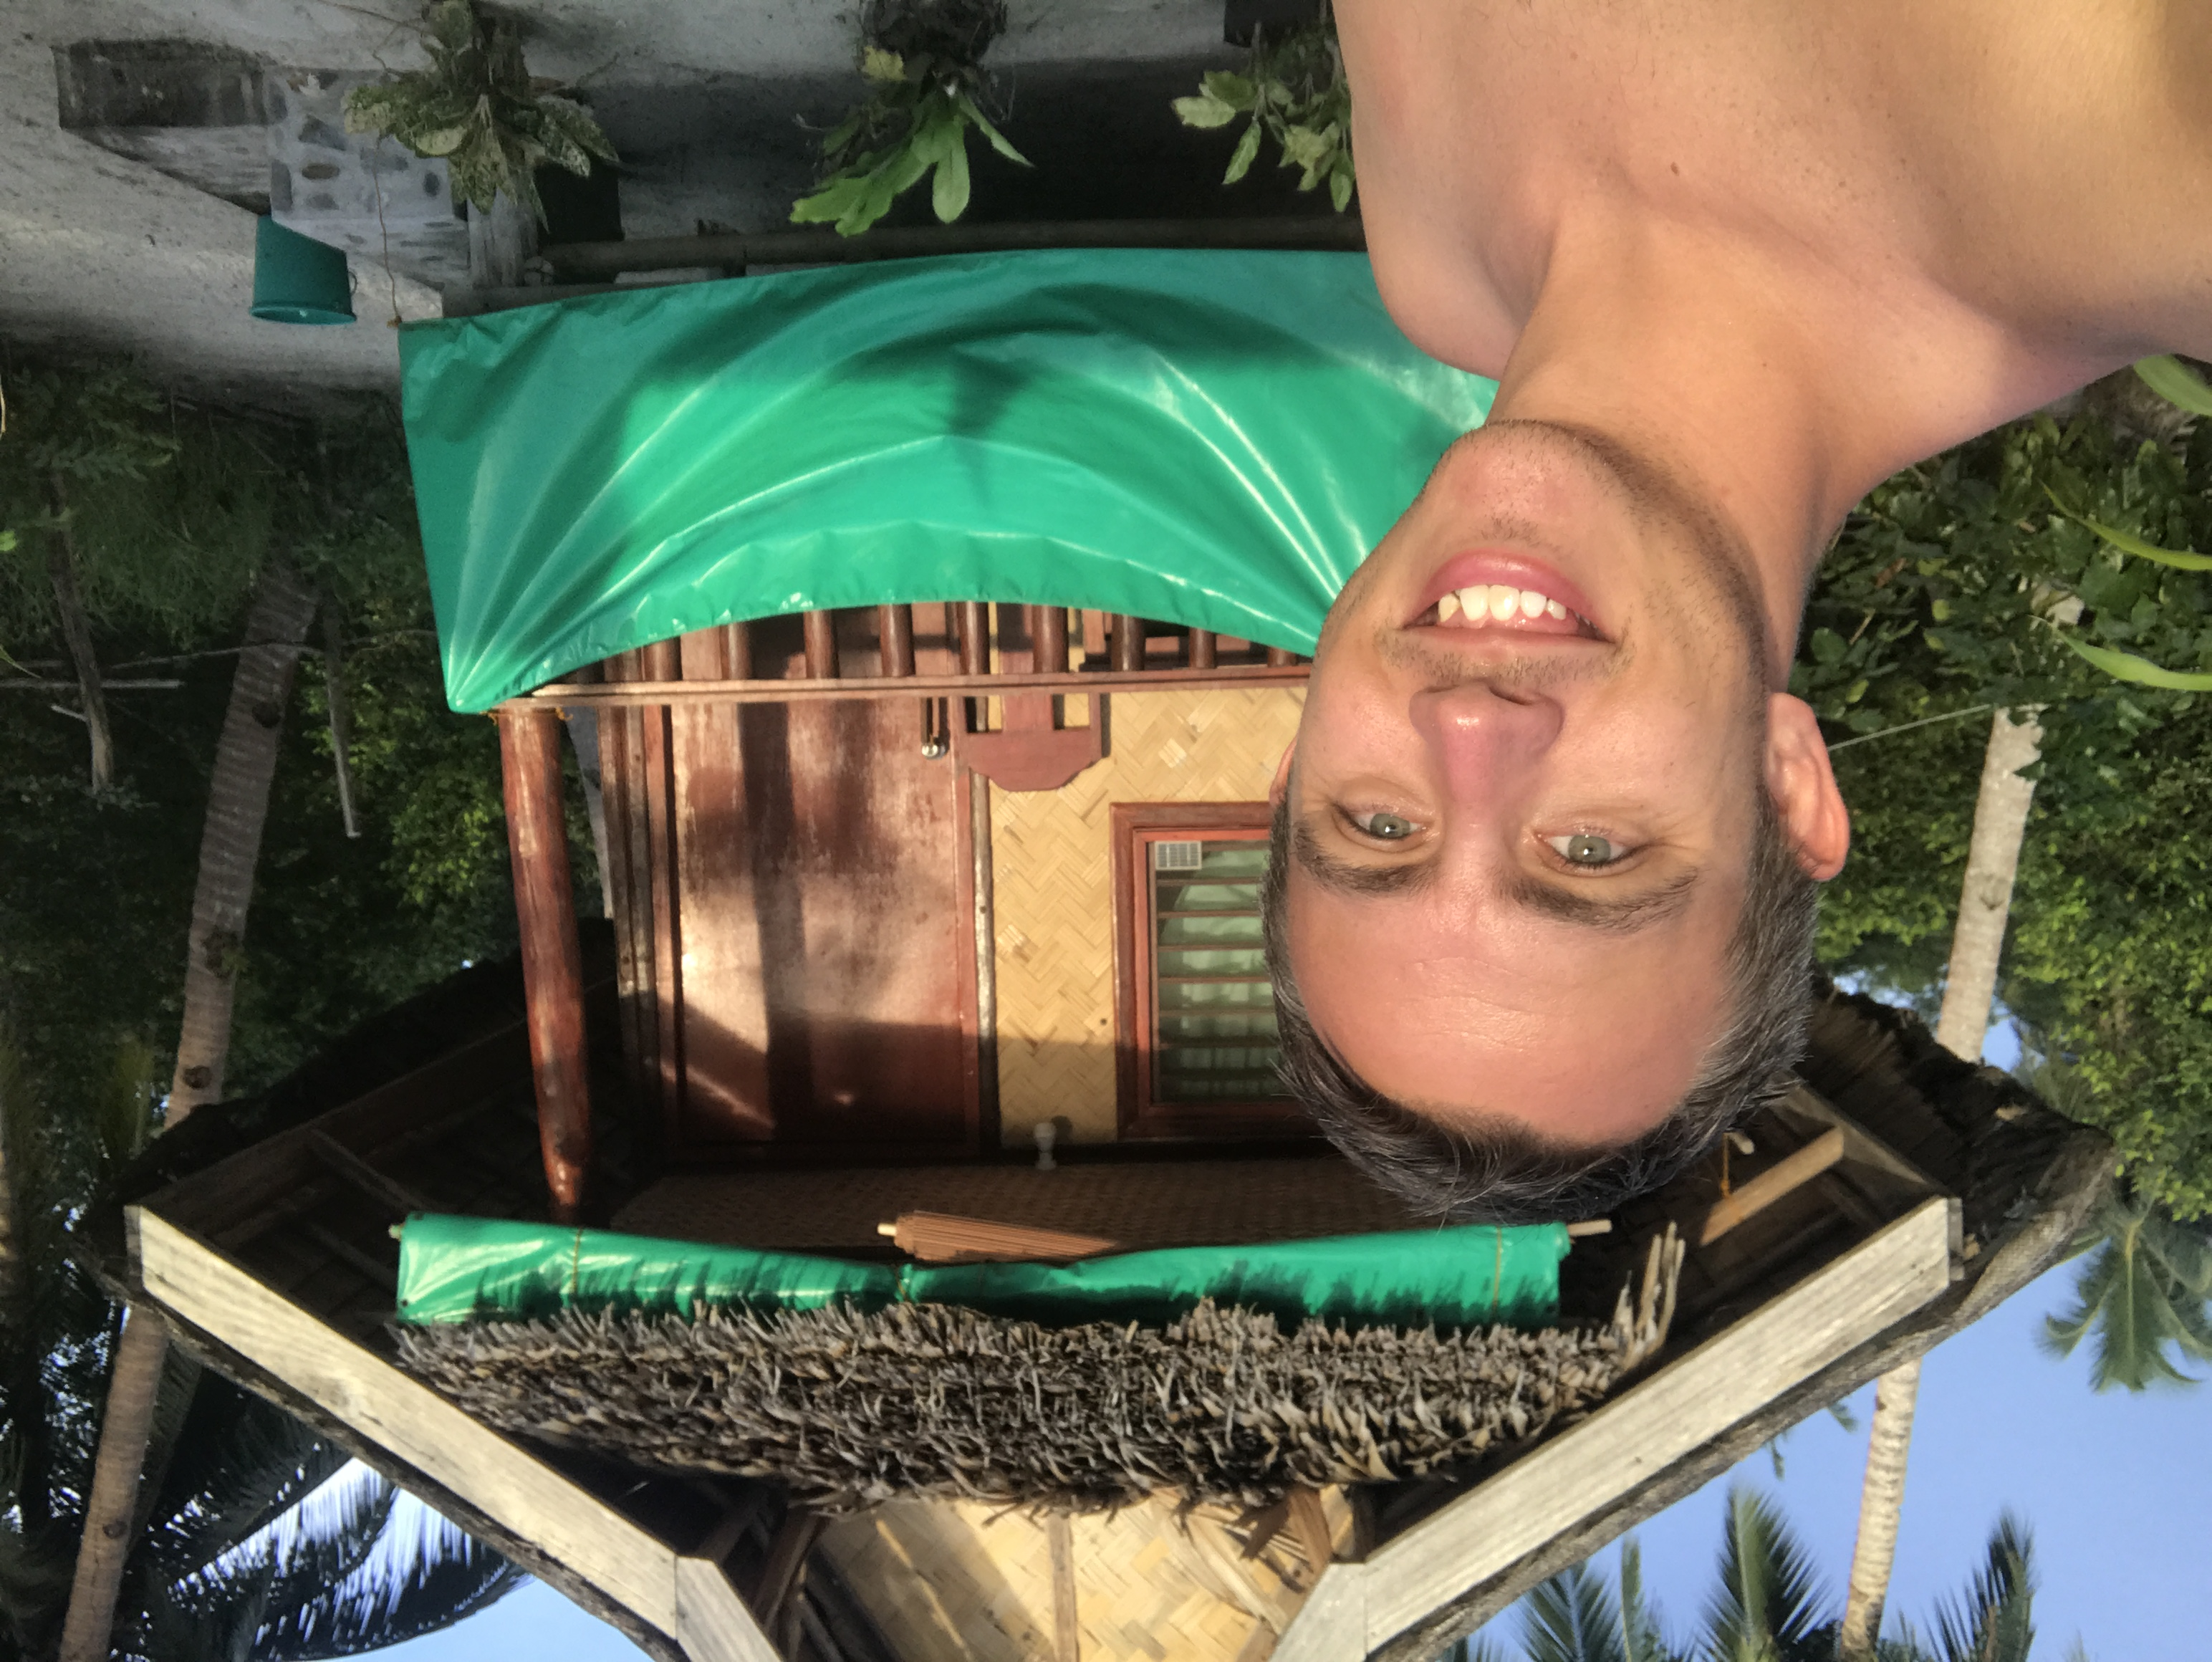 Selfie with my hut